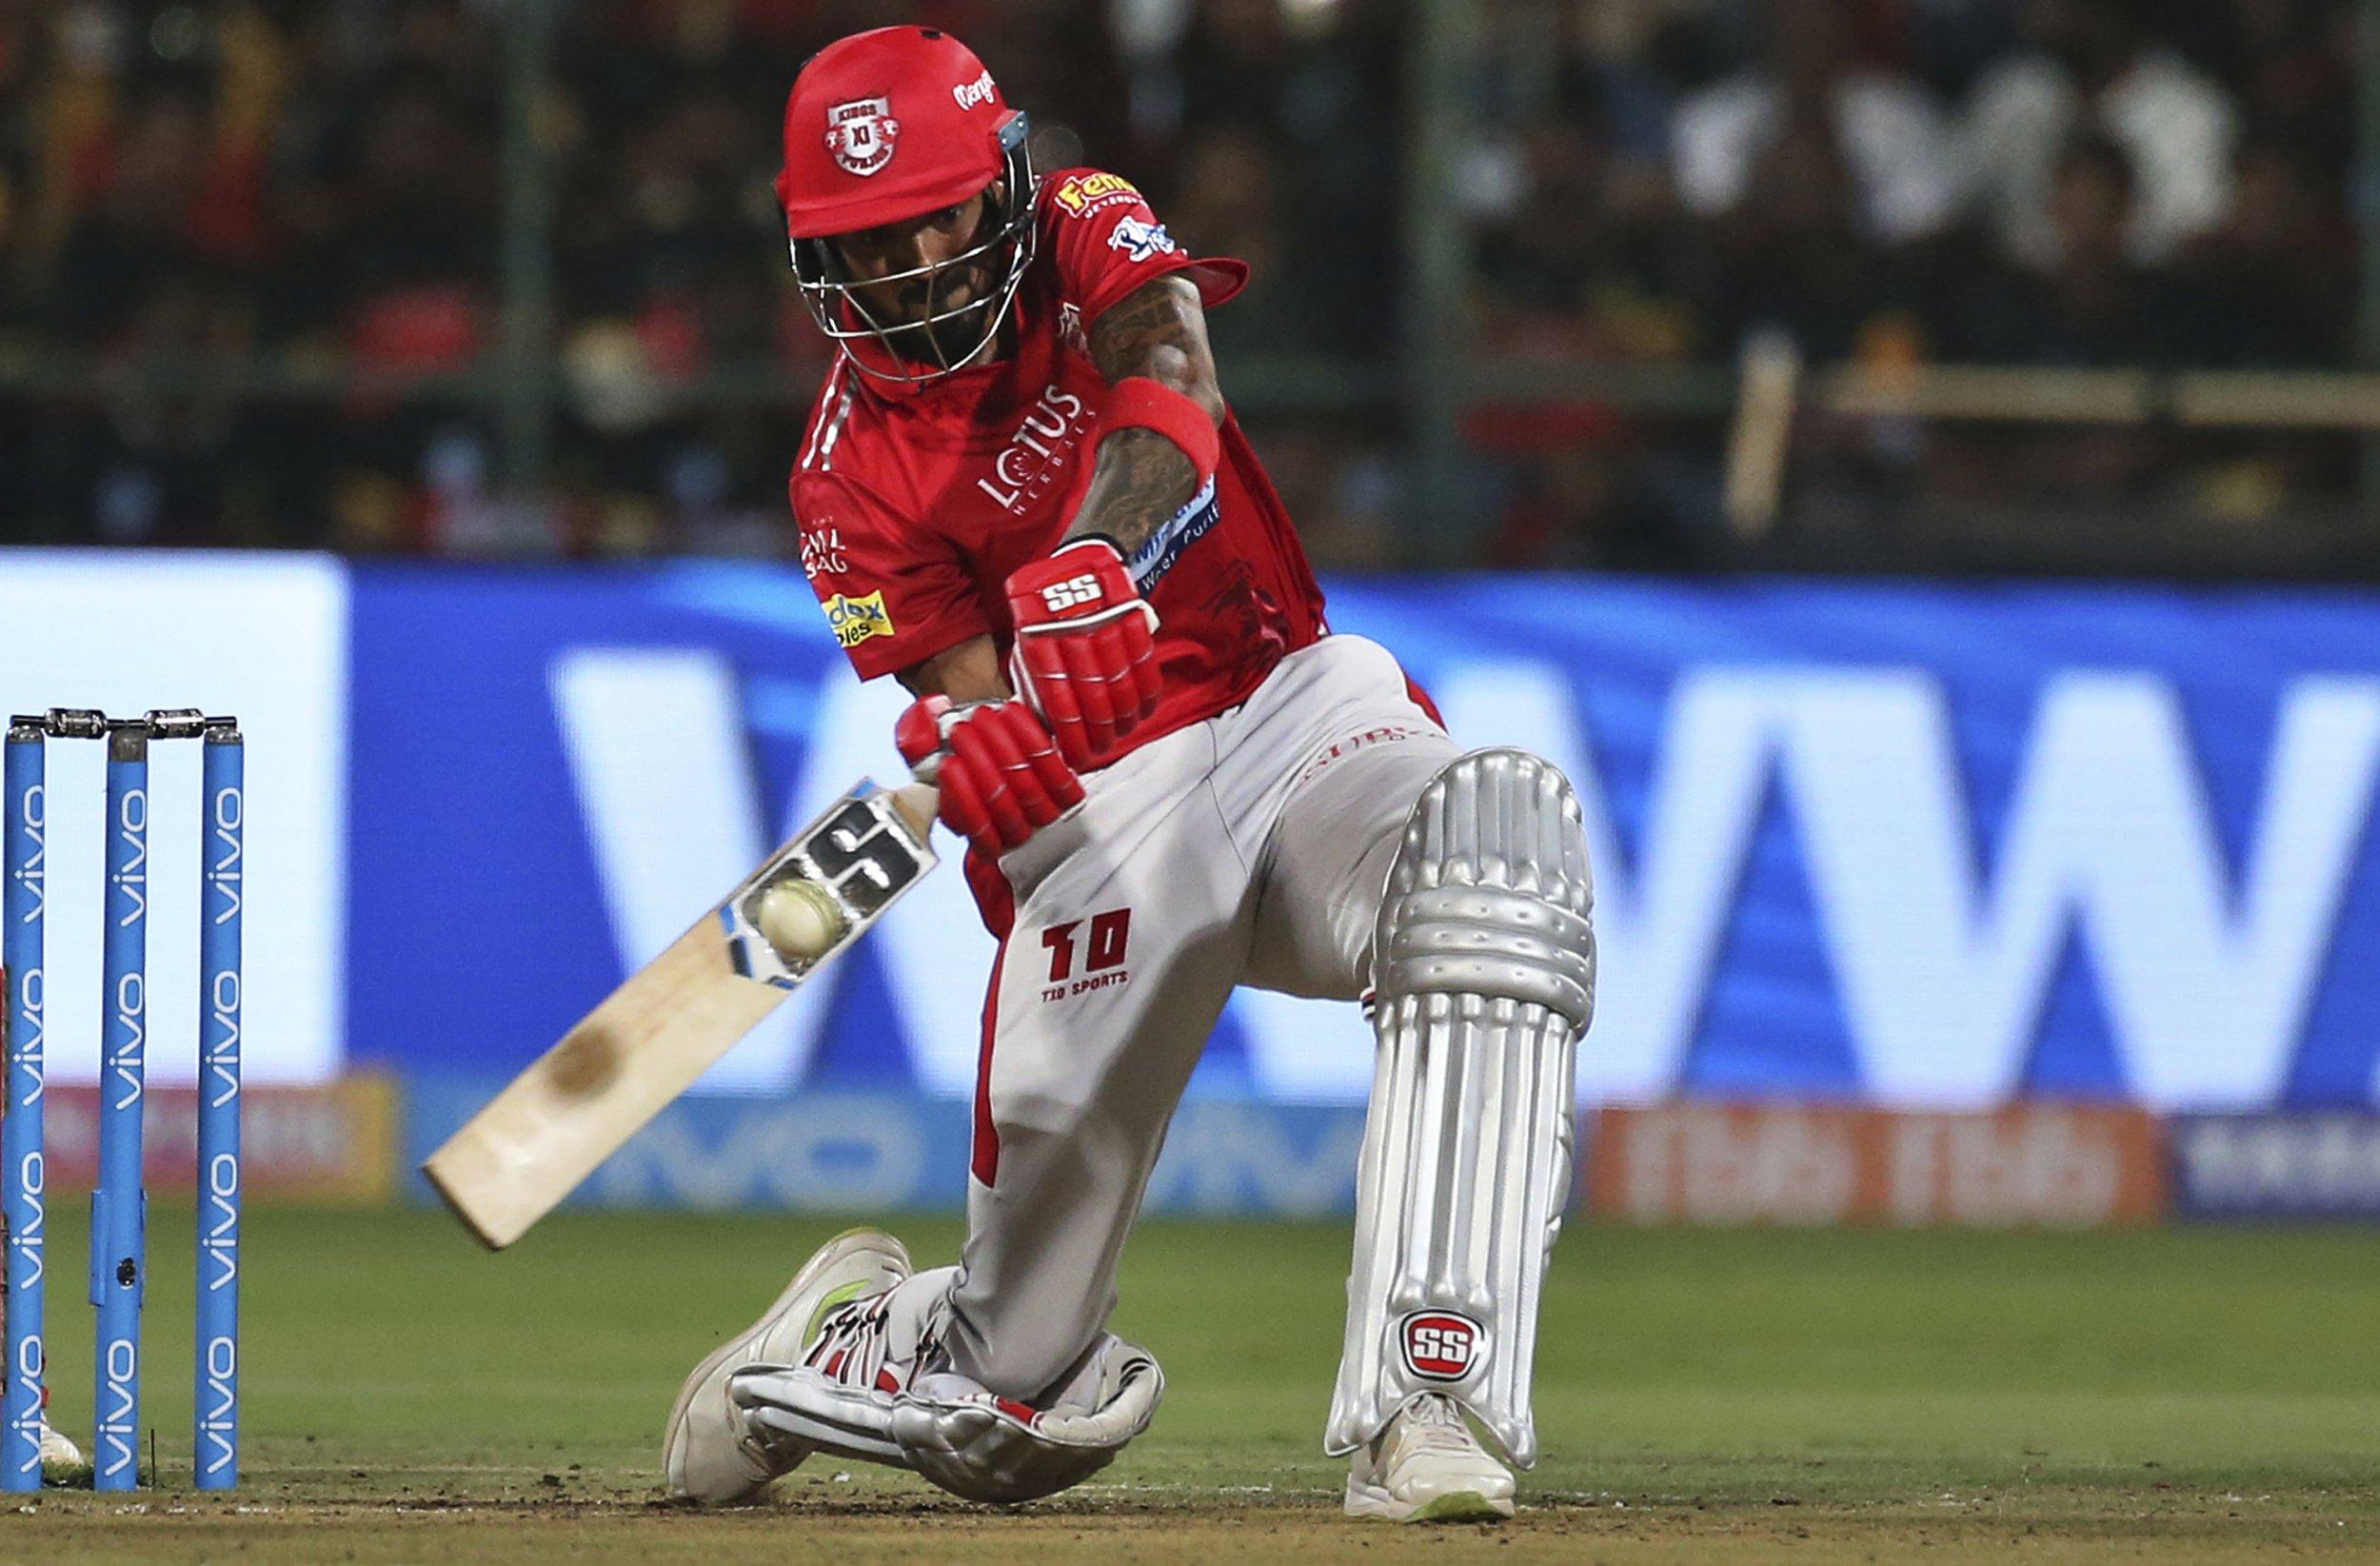 Kings XI Punjab v Royal Challengers Bangalore betting preview: Back IPL gun KL Rahul to keep delivering